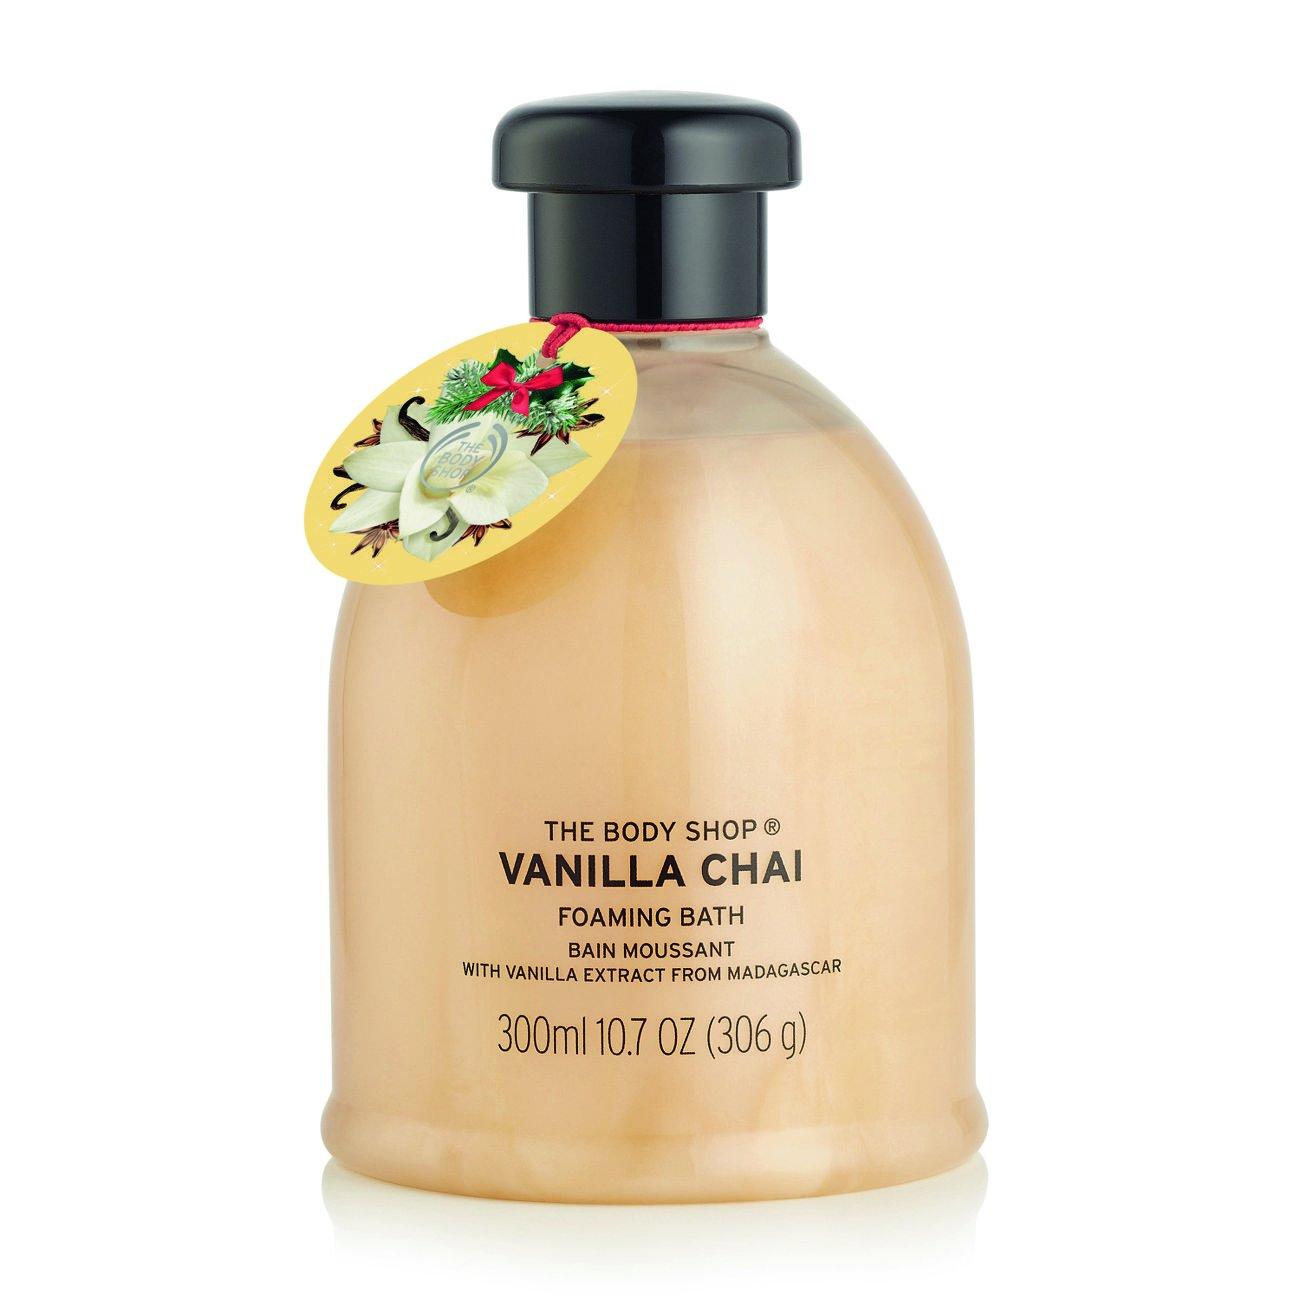 THE BODY SHOP VANILLA CHAI FOAMING BATH 300ML